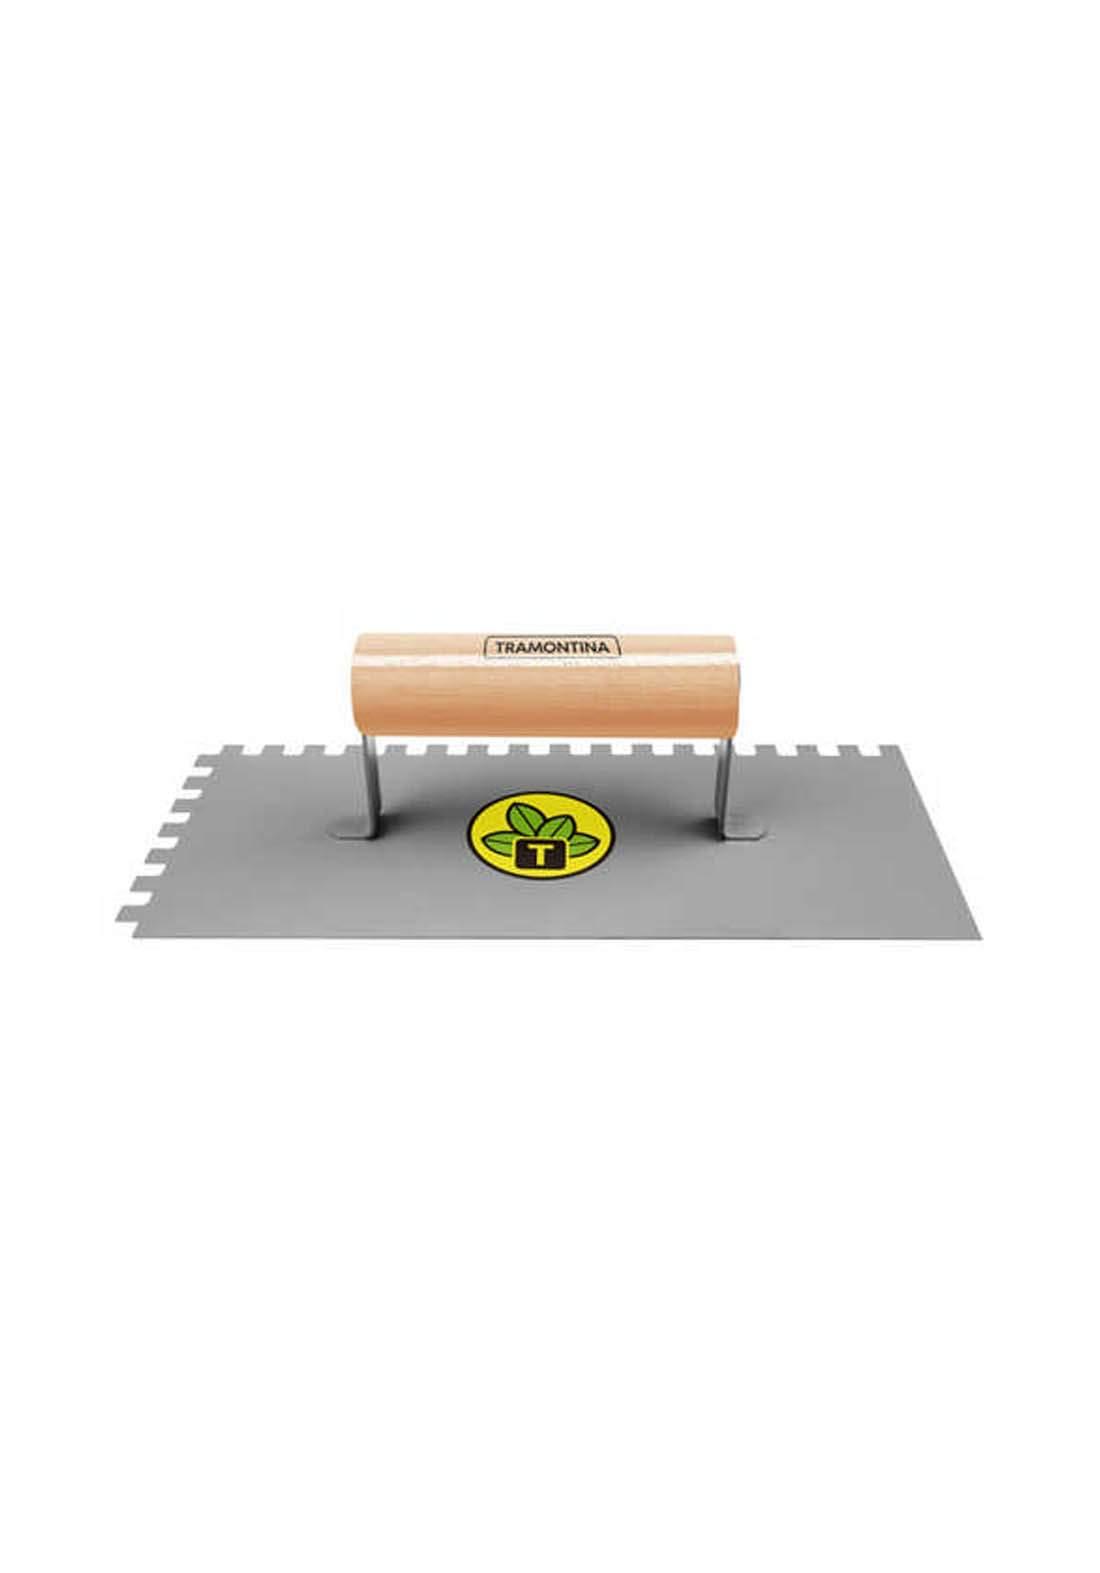 Tramontina'77376/115Brazilian serrated trowel with wood handle مالج مسنن مع مقبض خشب